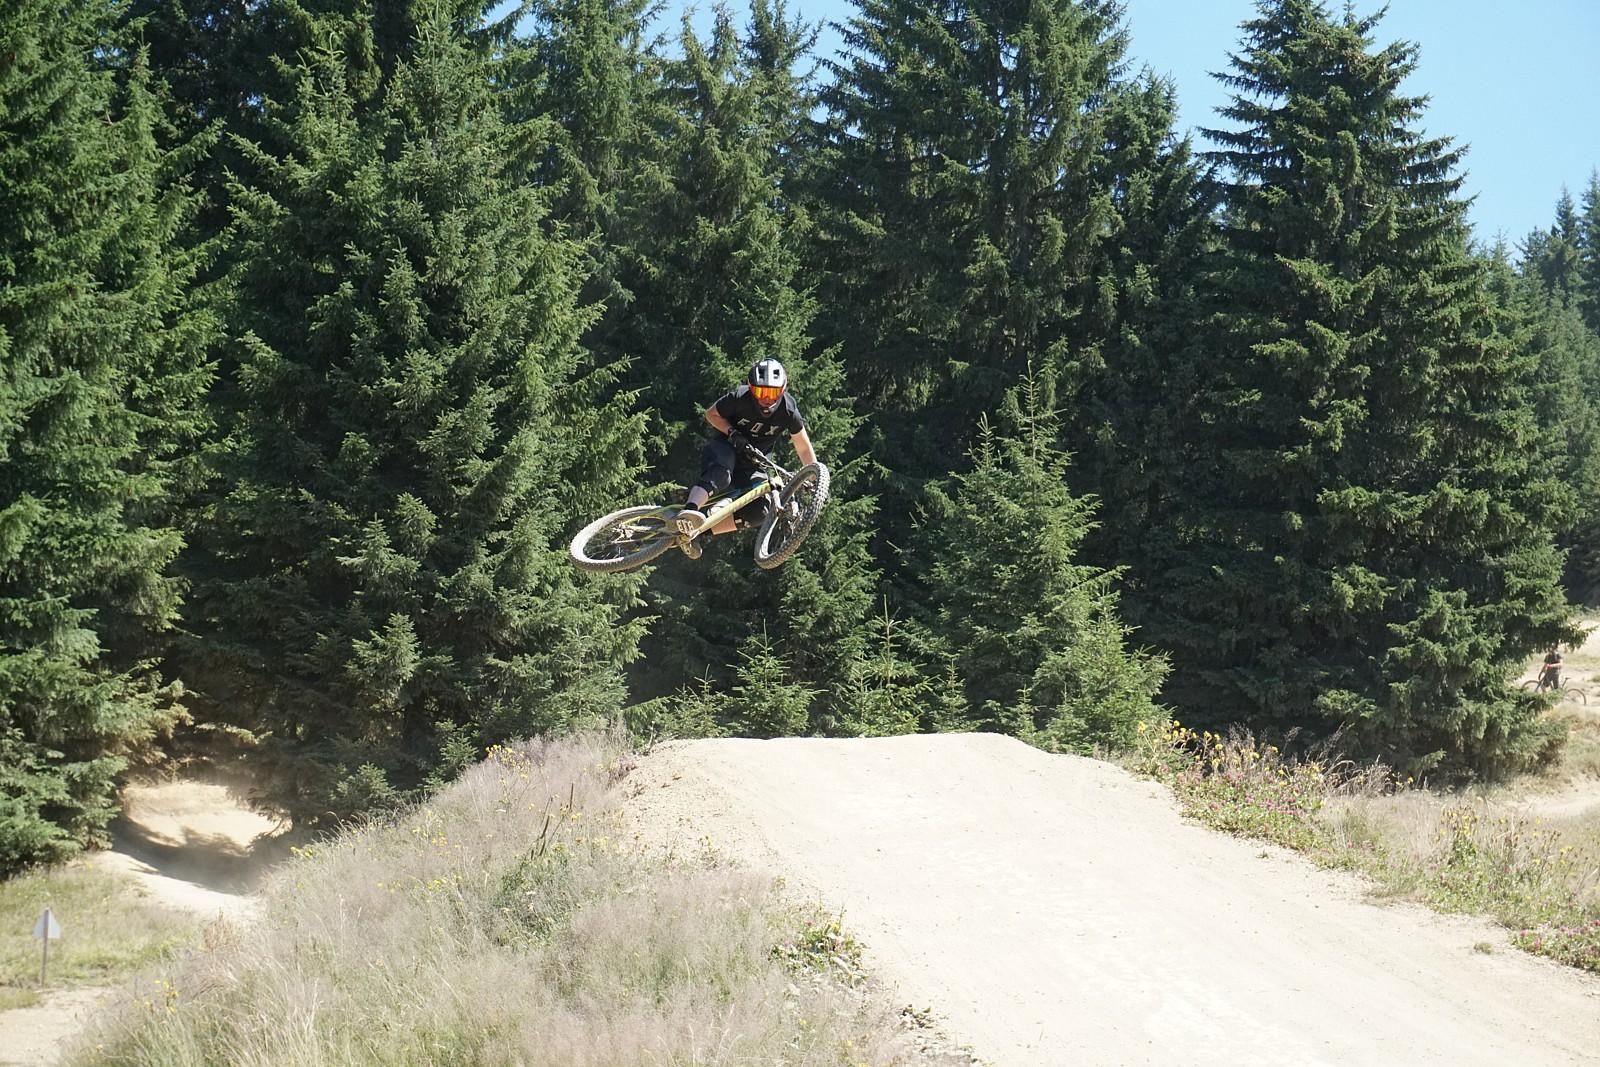 DSC08446 - c1c51 - Mountain Biking Pictures - Vital MTB